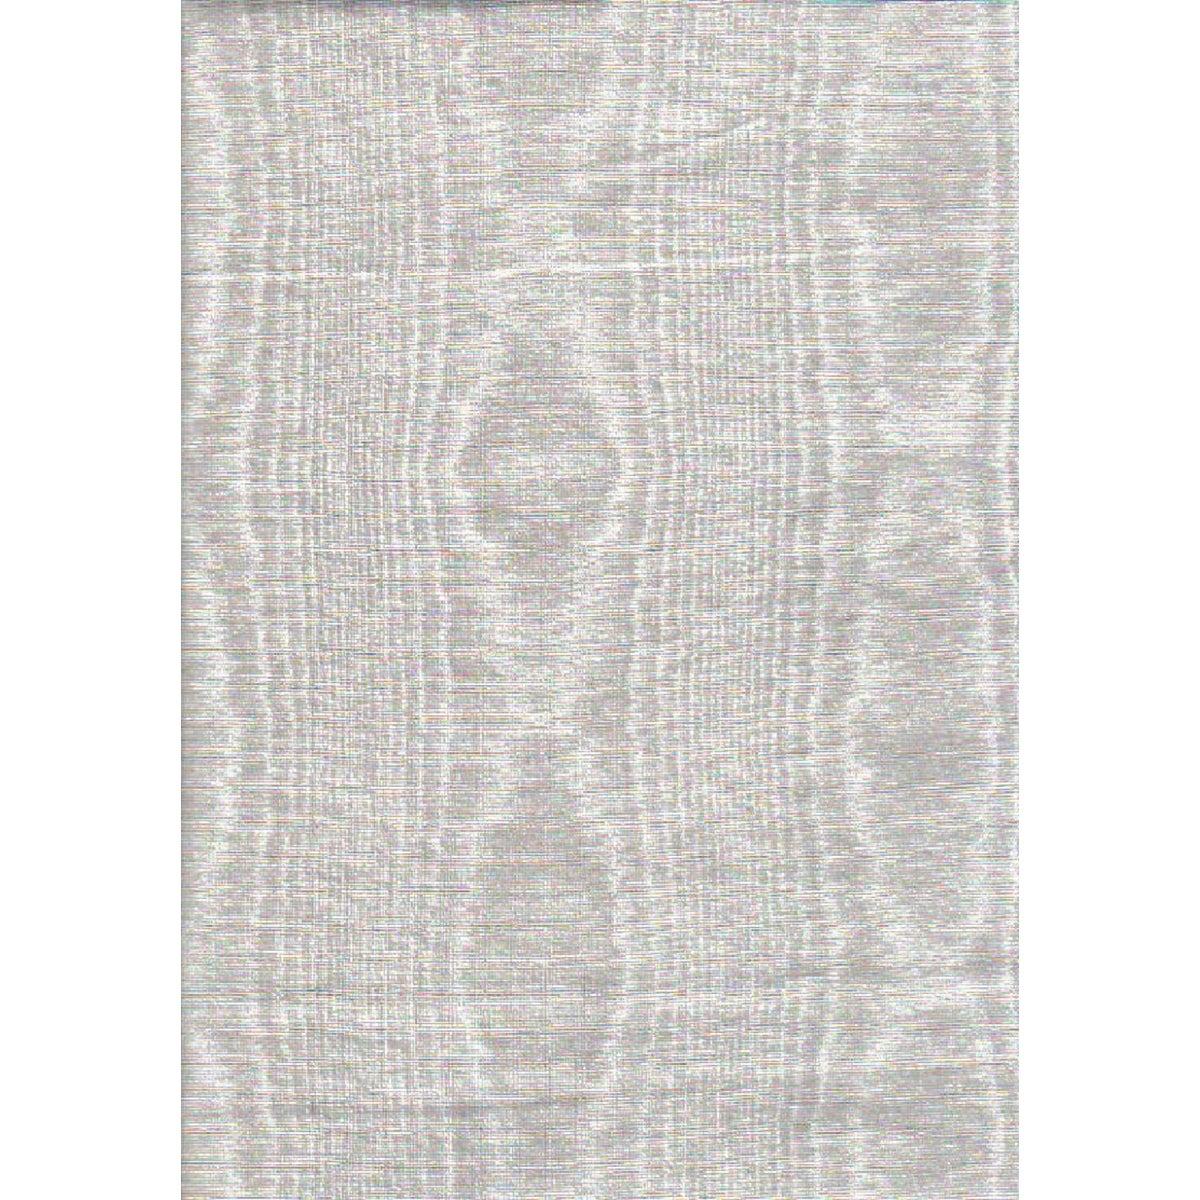 WHITE FLANNEL BACK VINYL - 0264 by Nordic Shield/epv